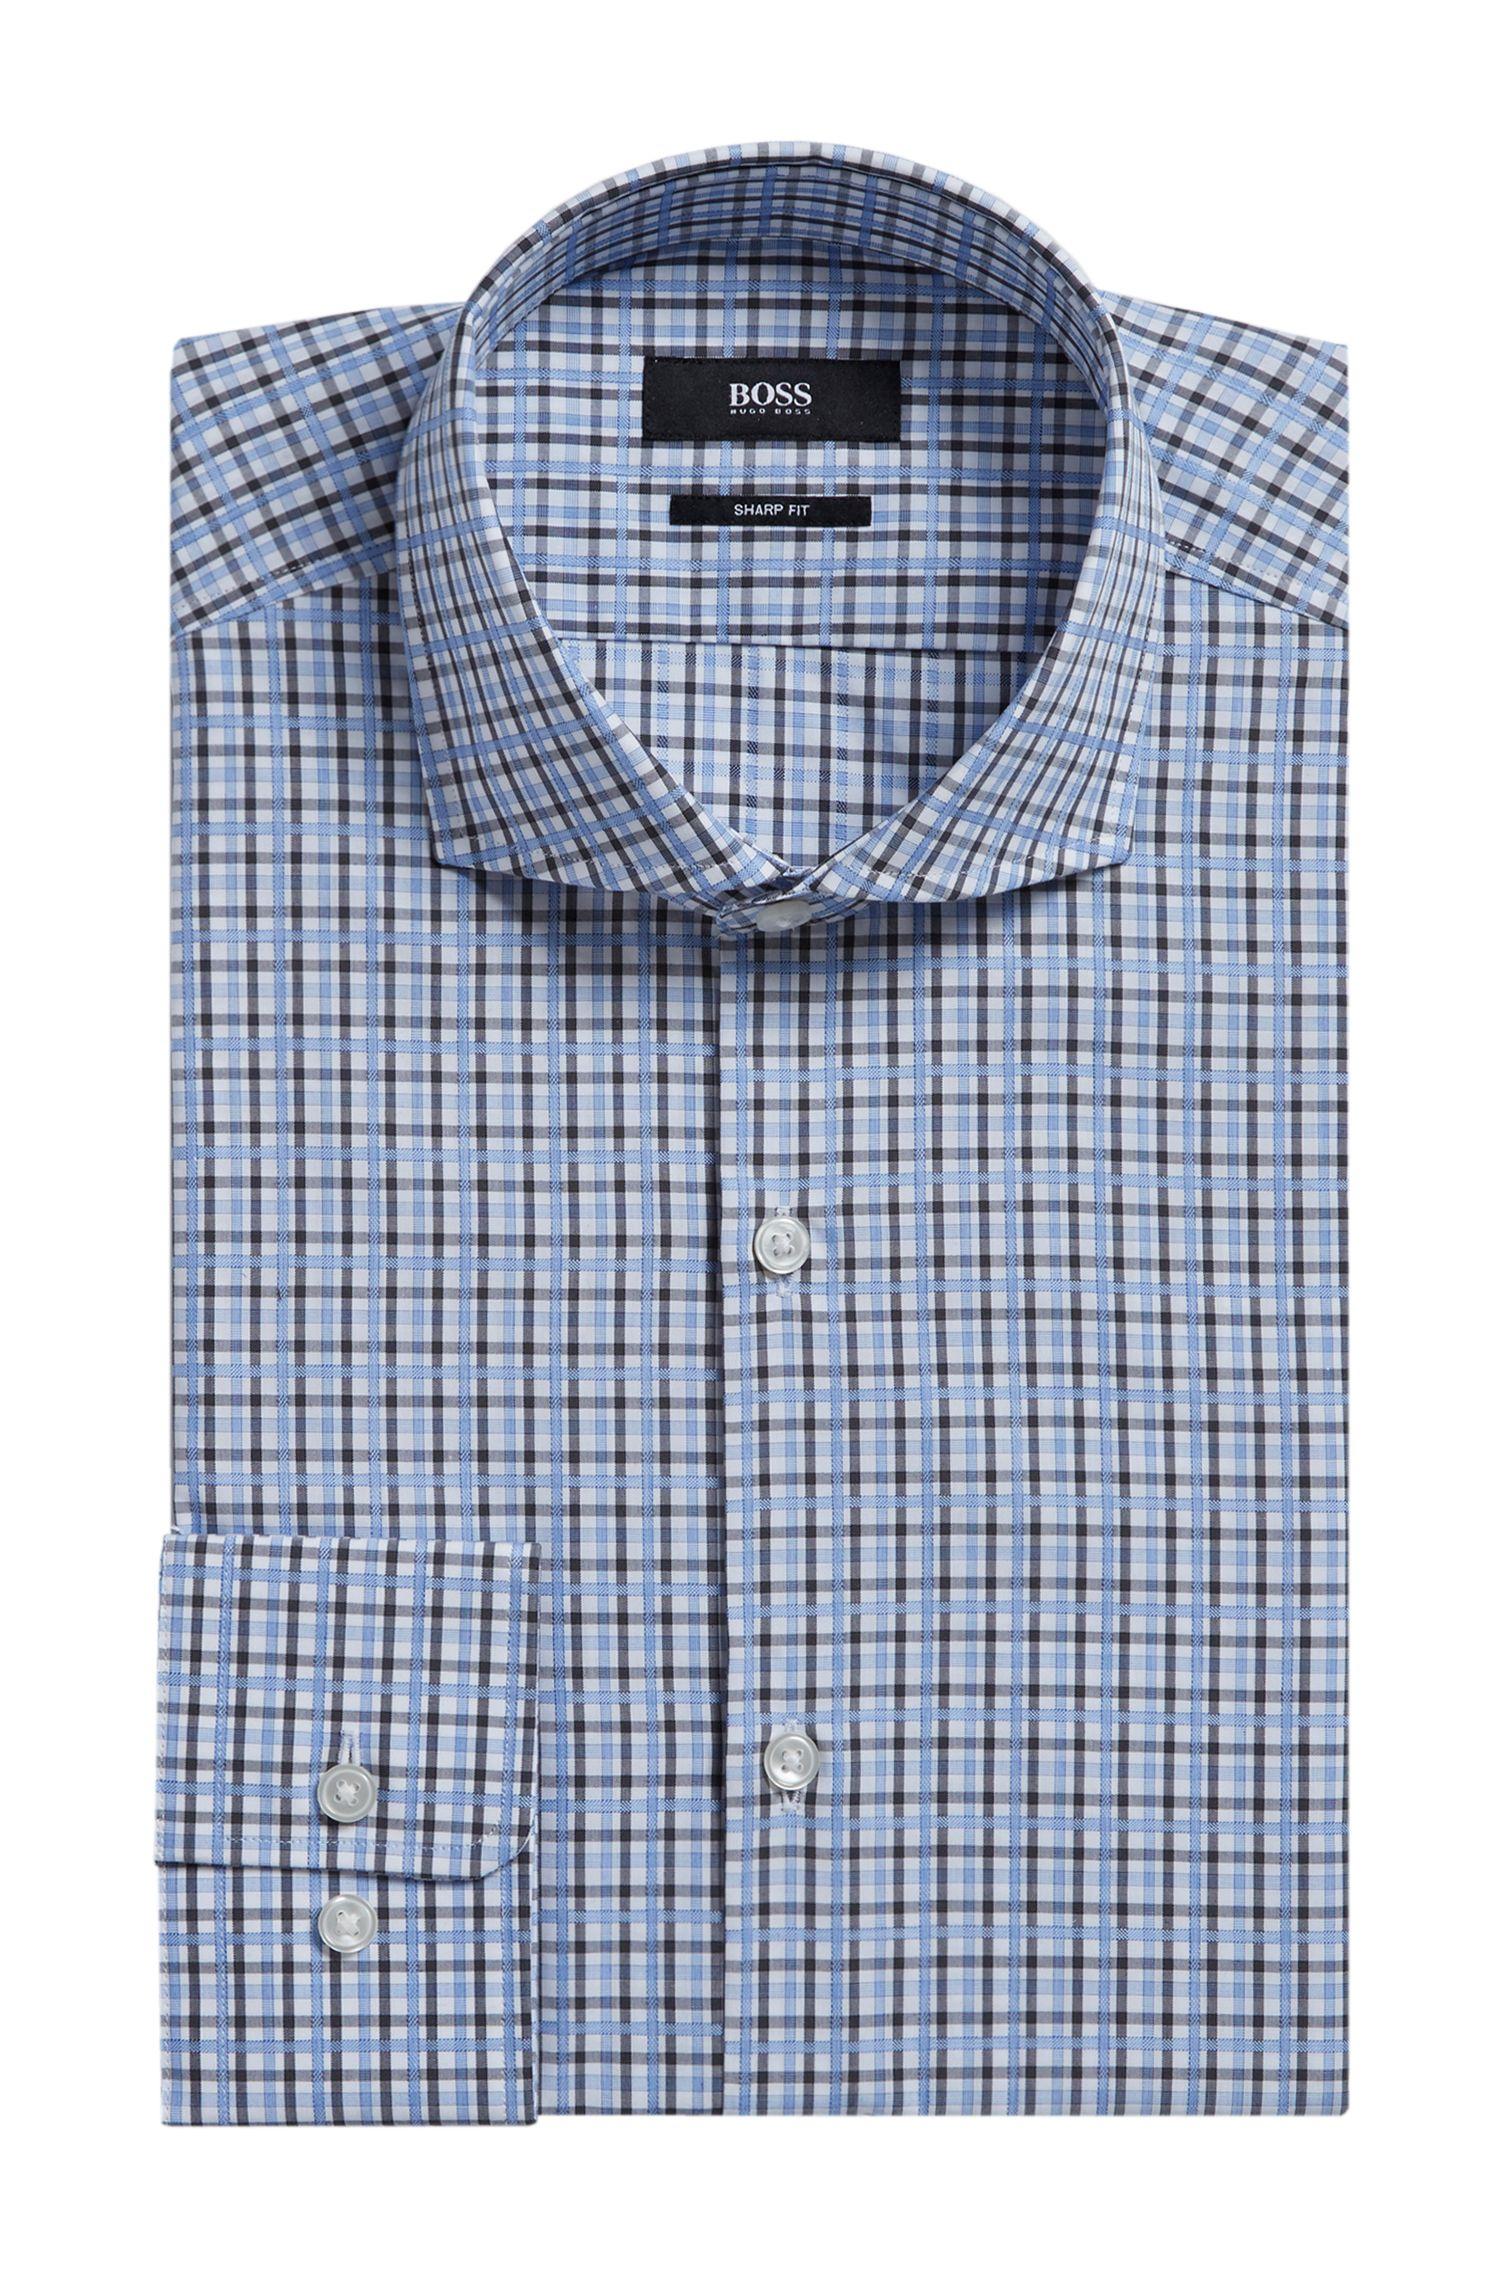 Plaid Cotton Dress Shirt, Sharp Fit | Mark US